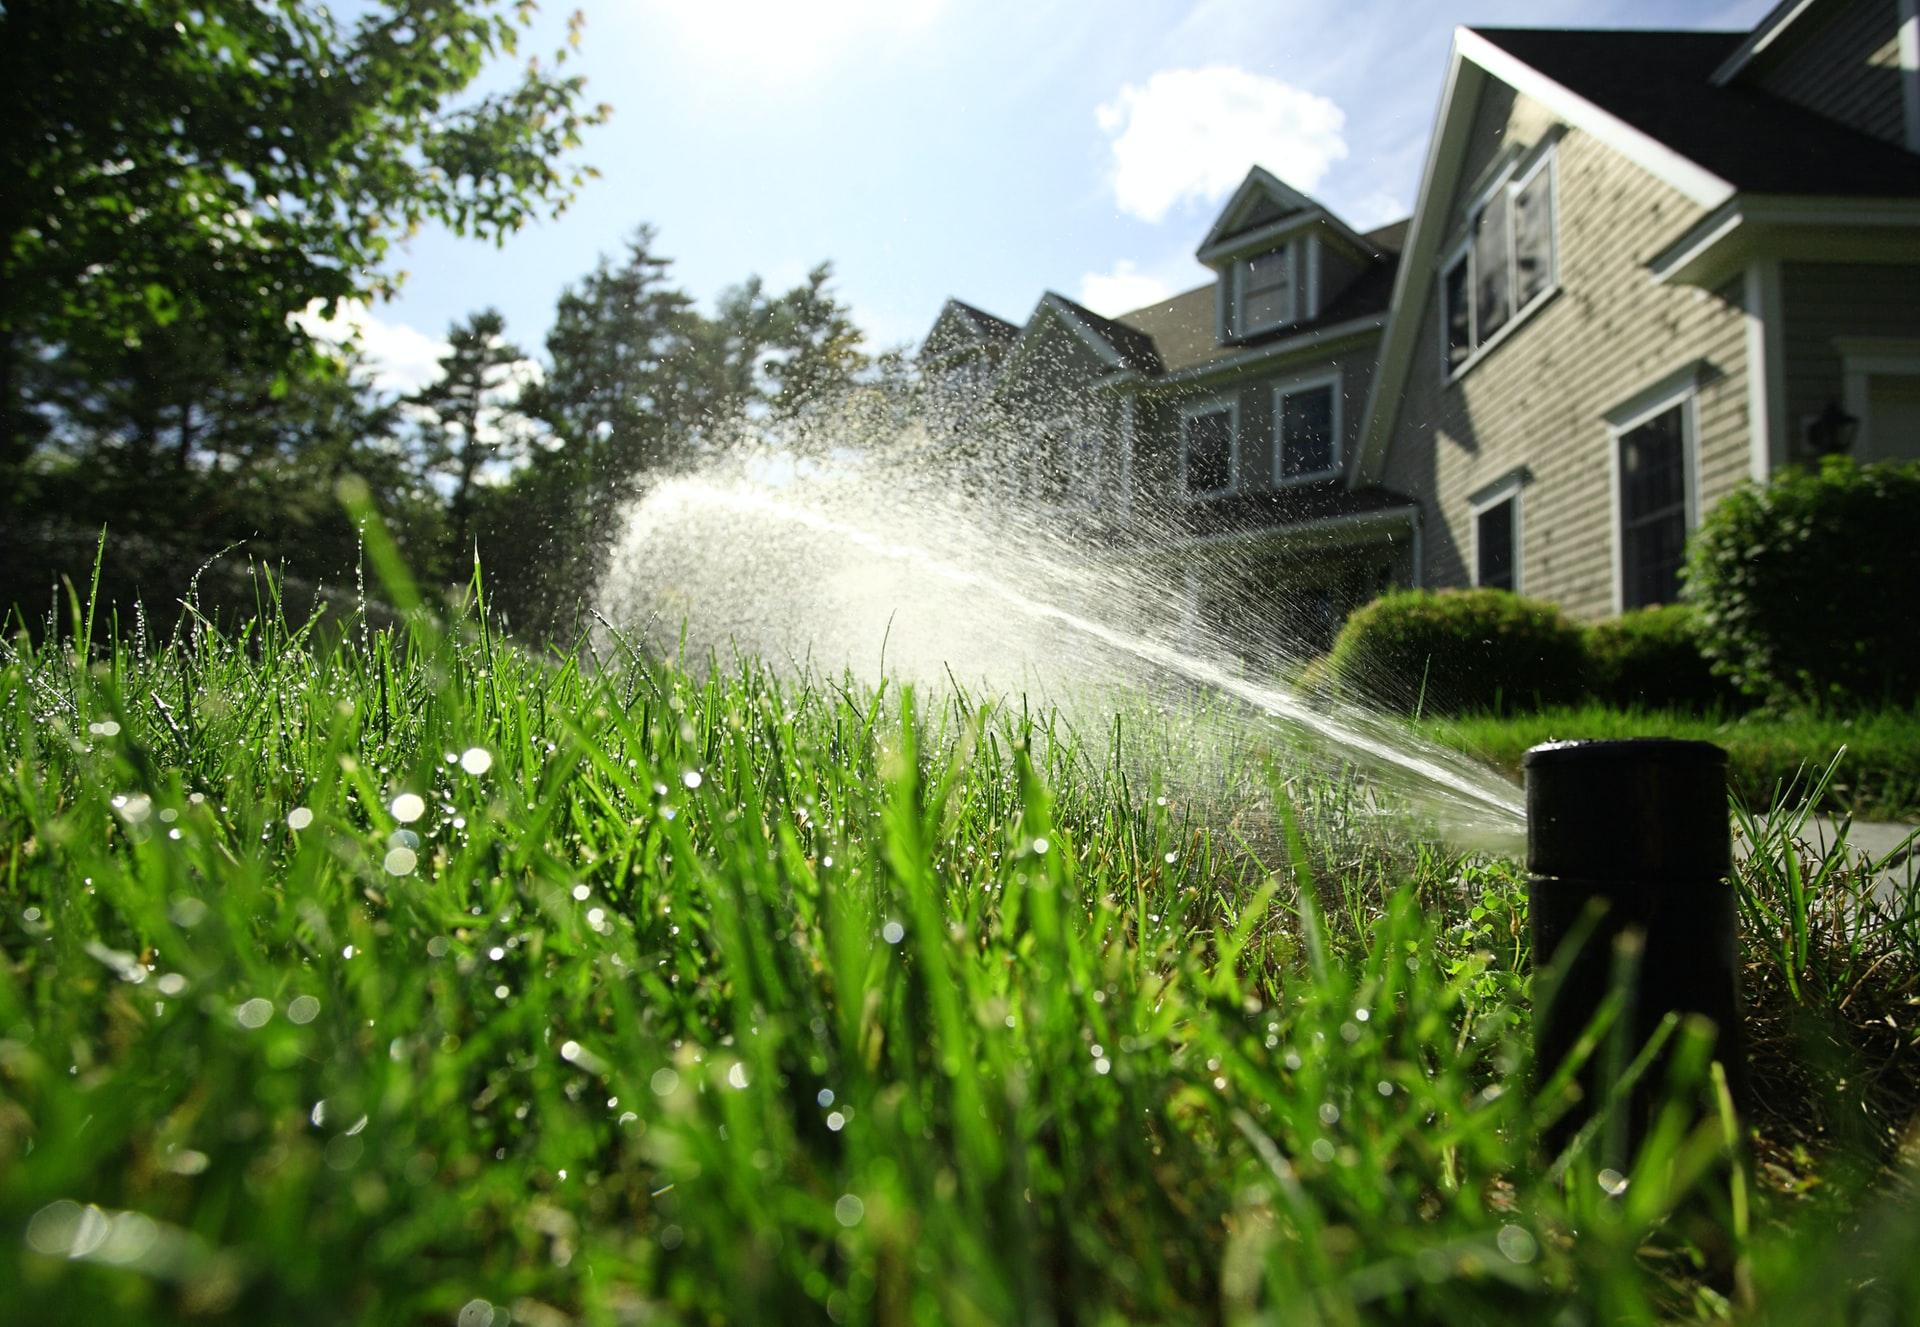 Sprinkler System Installation and Repair